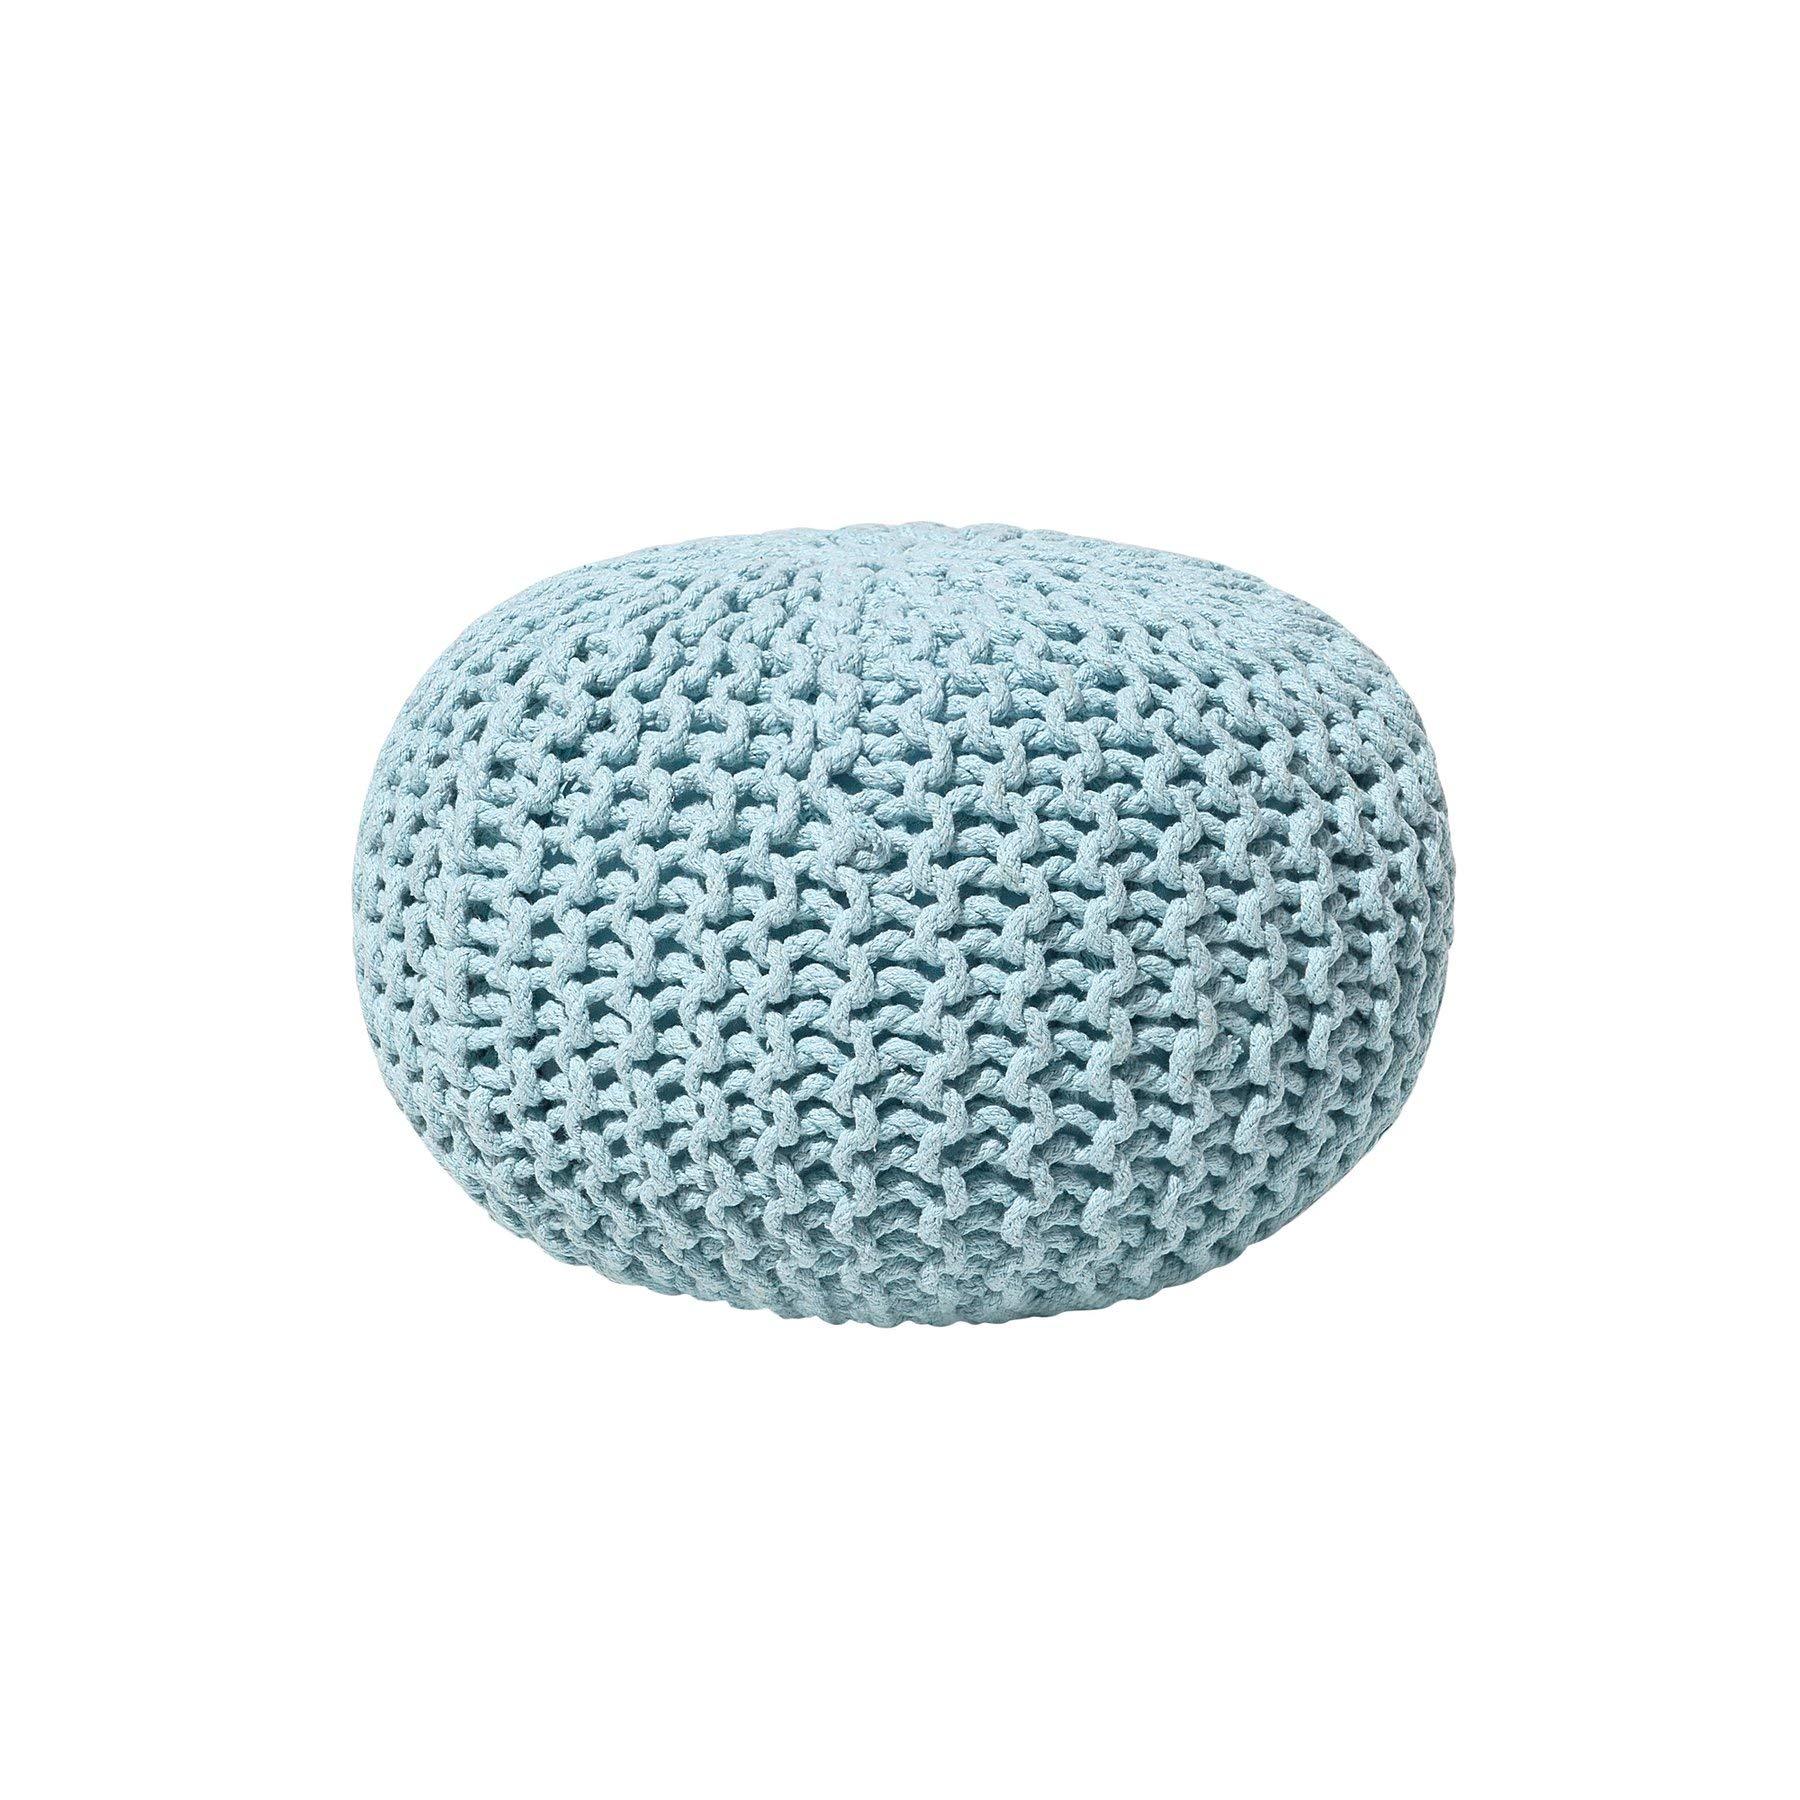 Beliani Modern Knitted Round Pouf Ottoman Soft Cotton Light Blue 16-inch Conrad